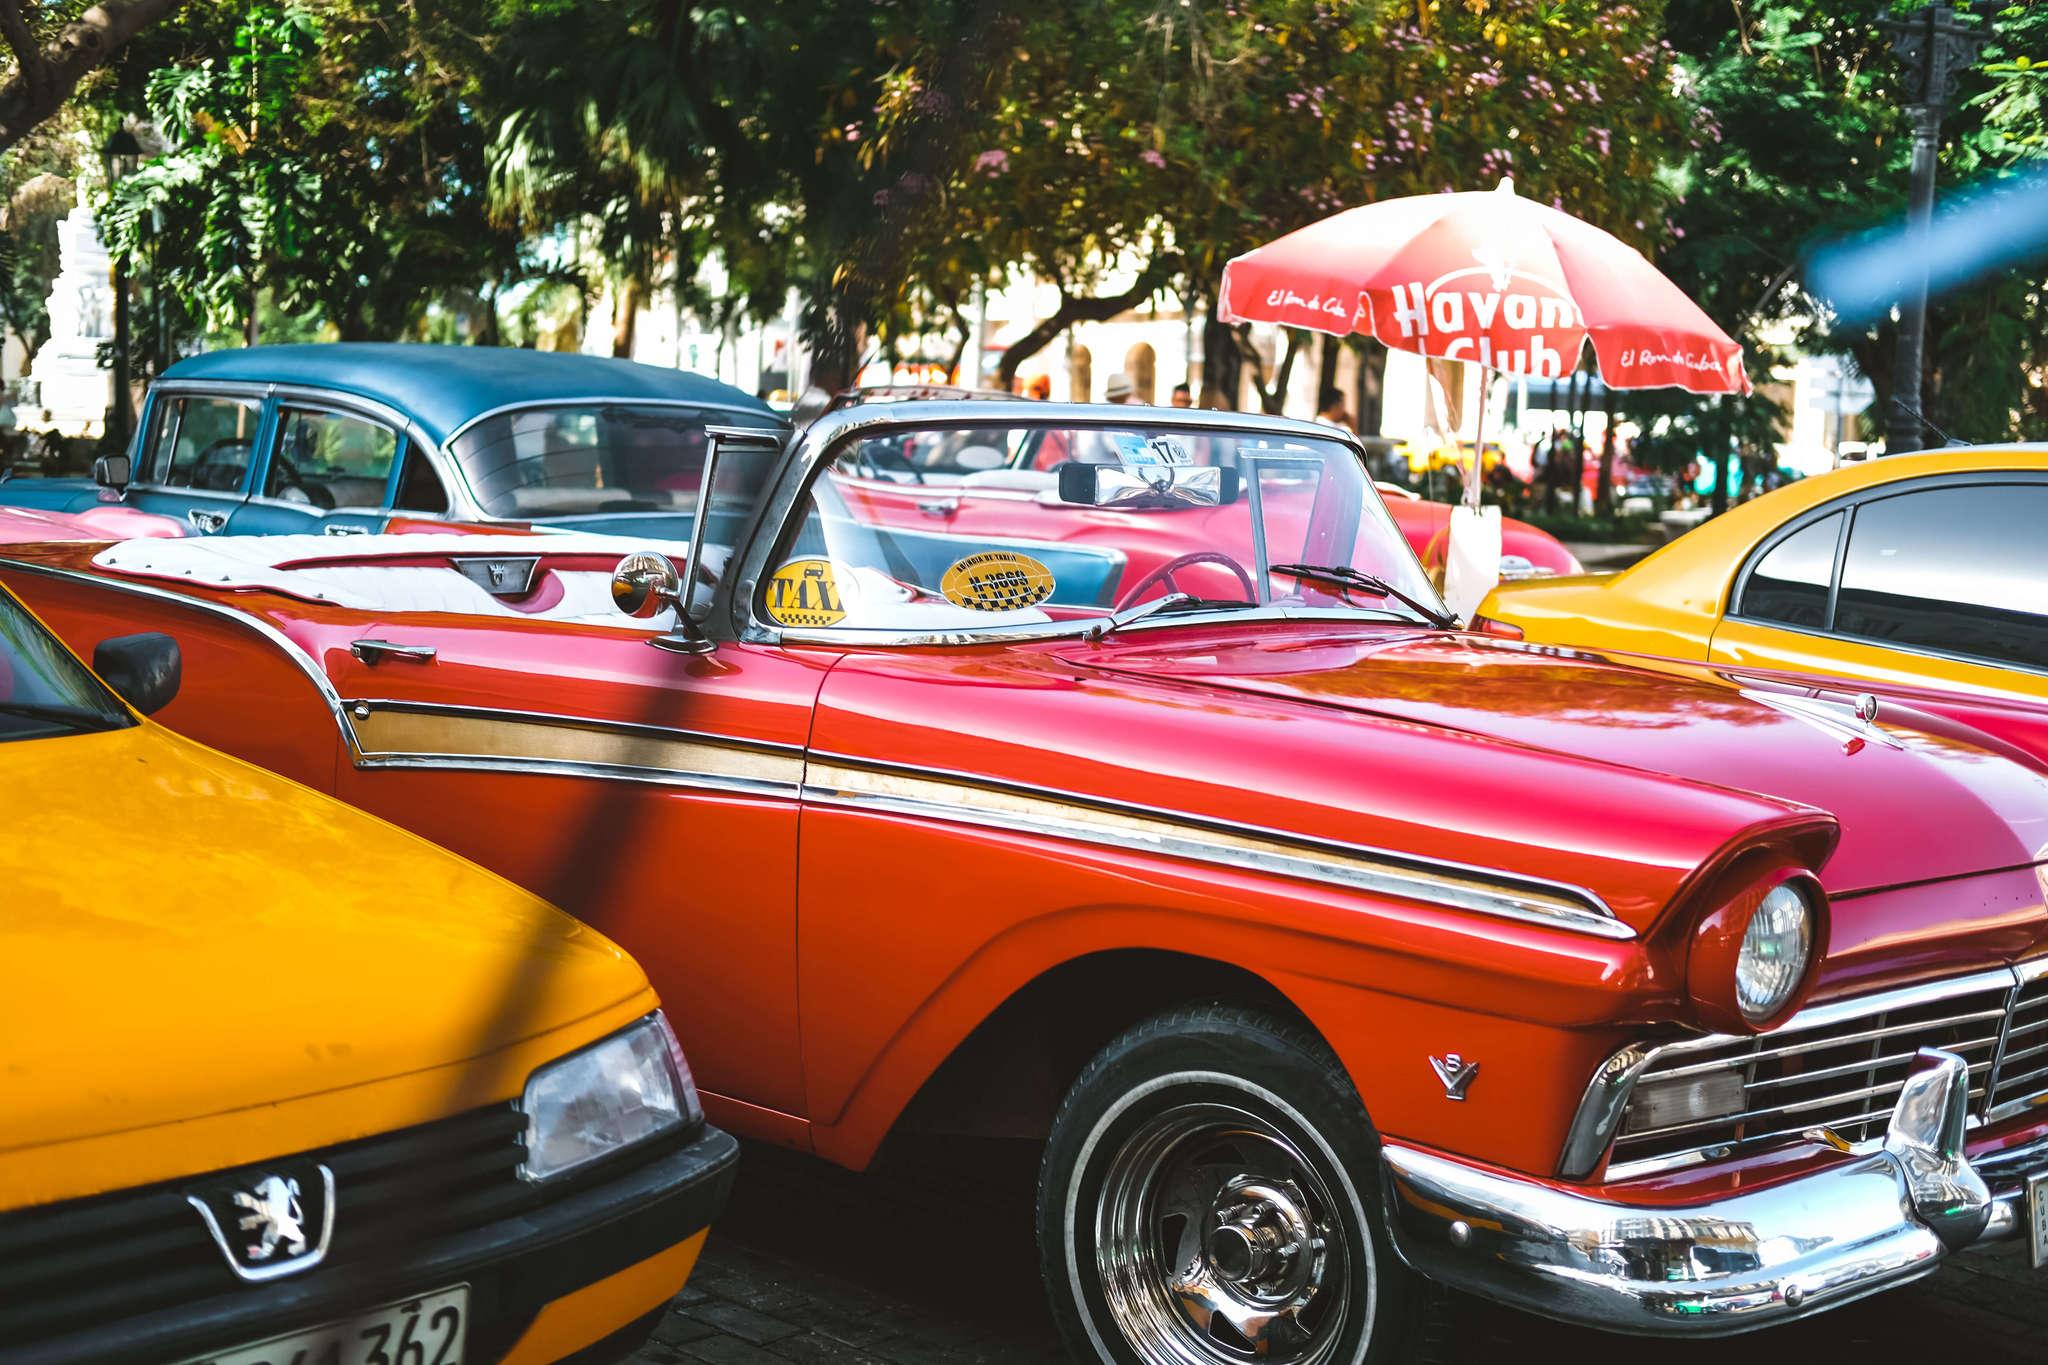 cars in Havana, Cuba